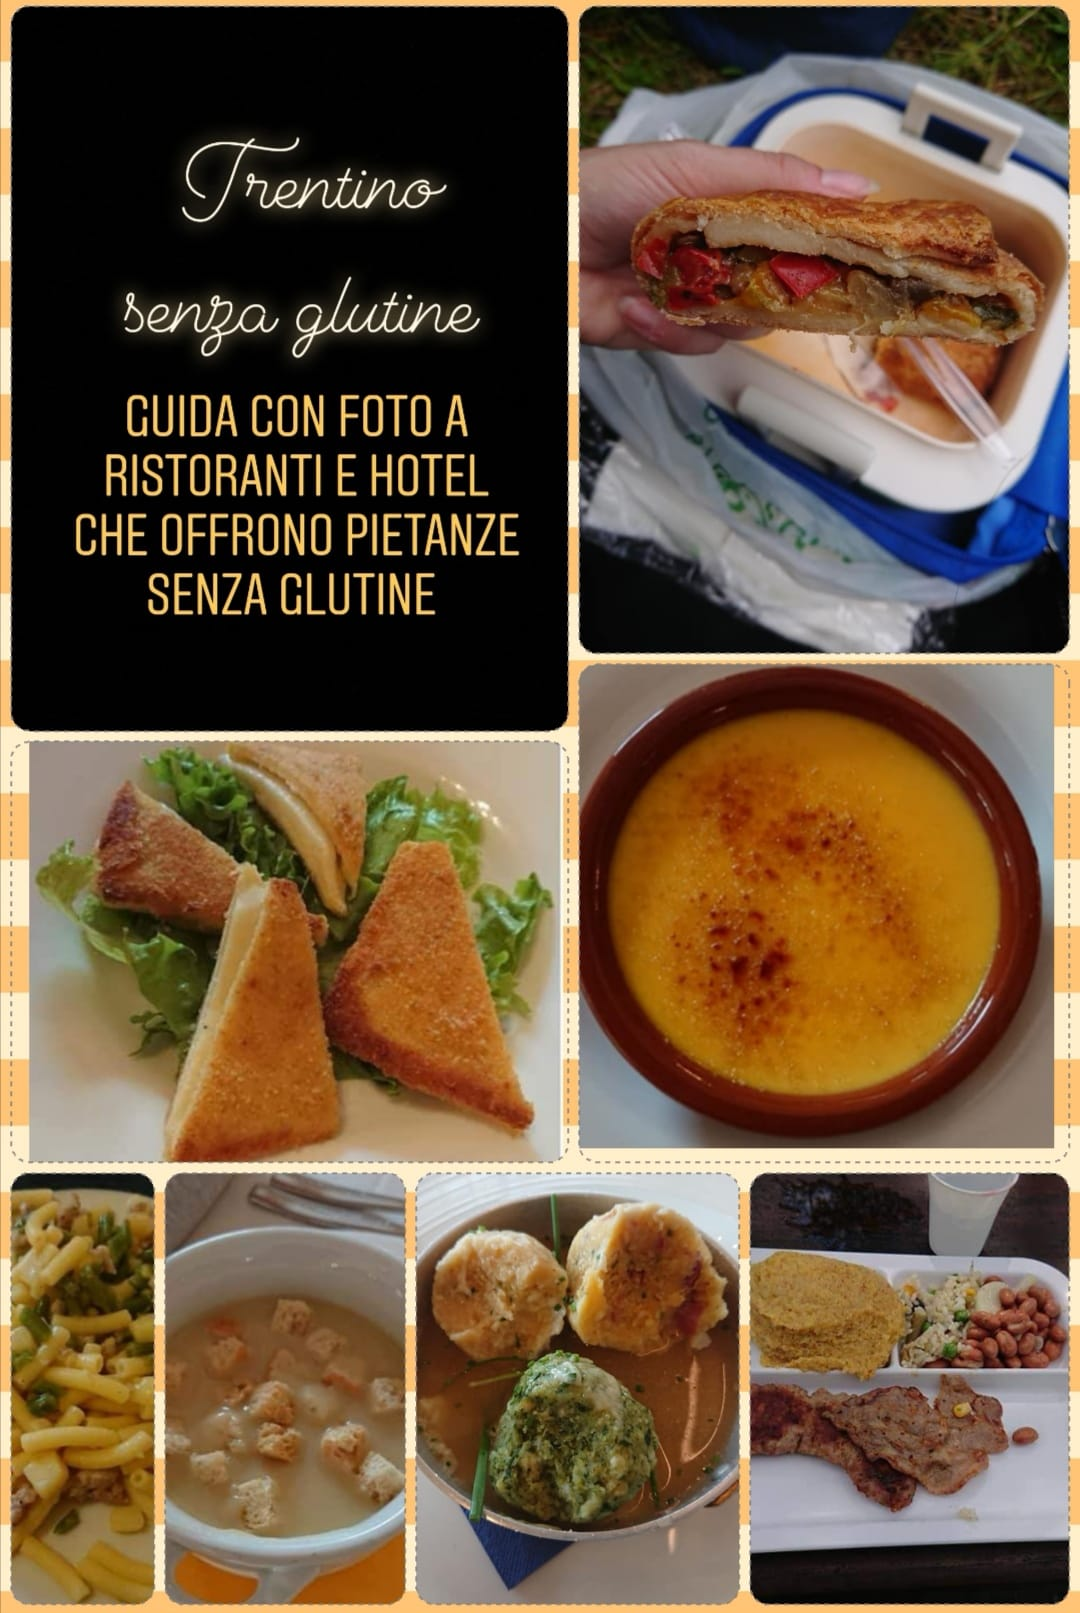 Trentino senza glutine